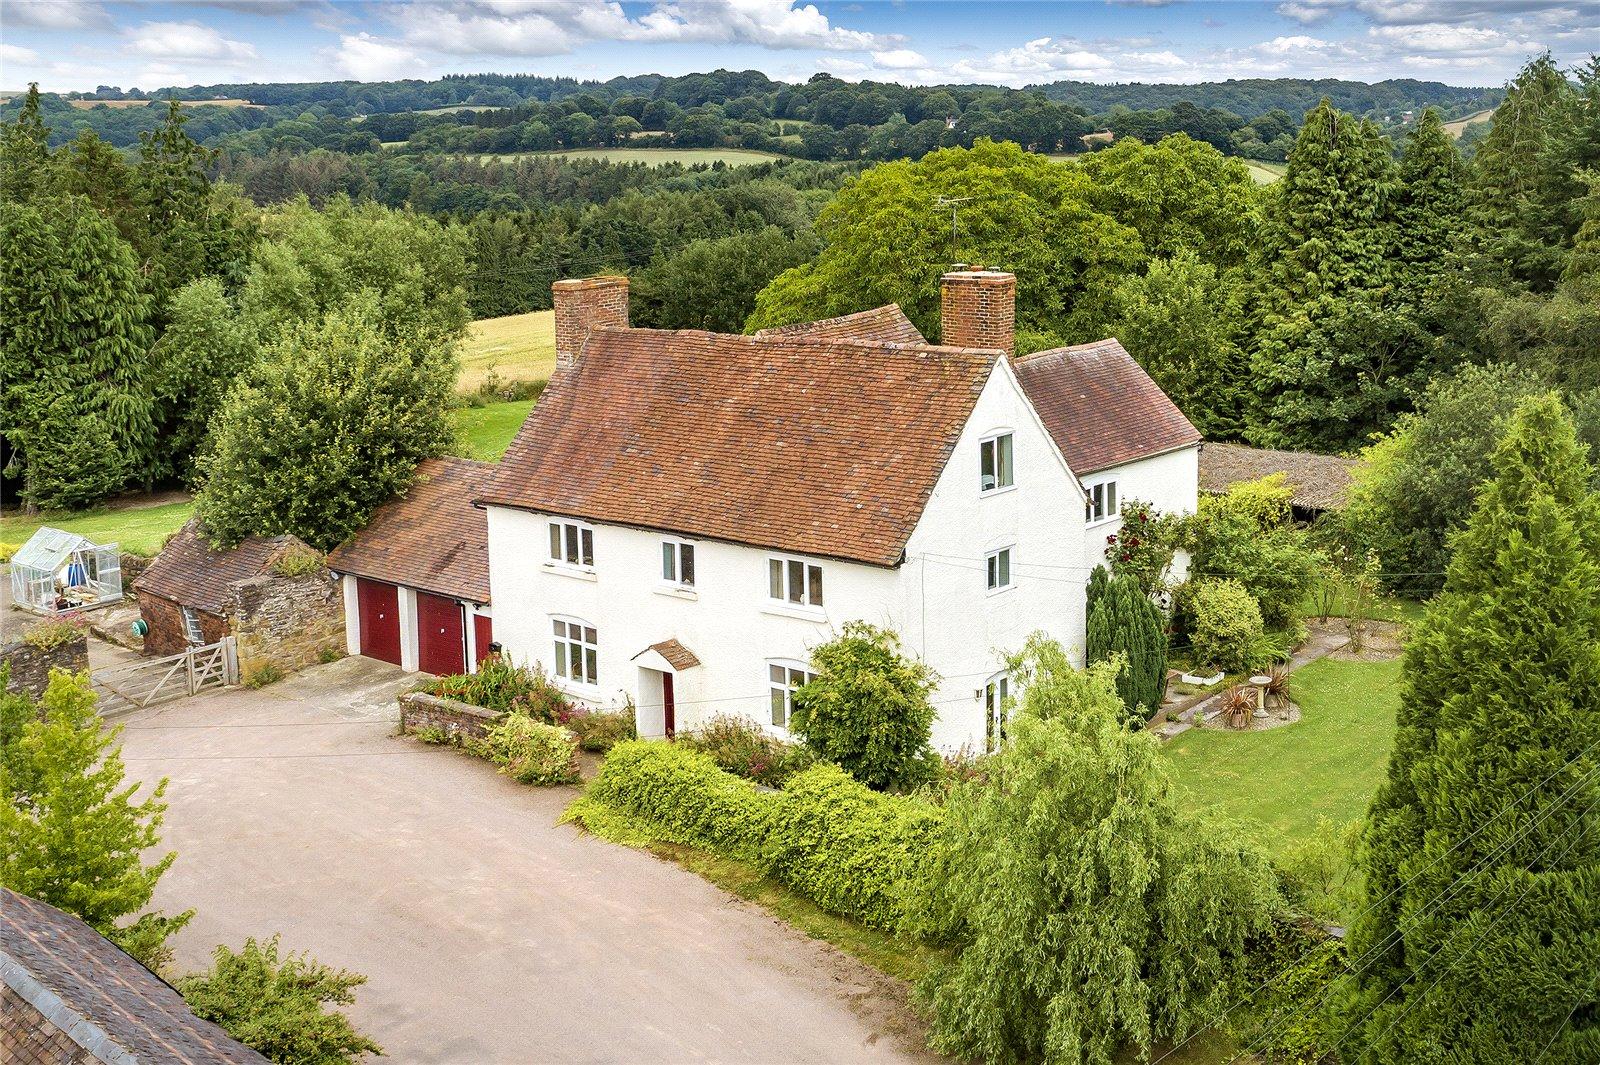 Wall Town Farm, Cleobury Mortimer, Kidderminster, Shropshire, DY14